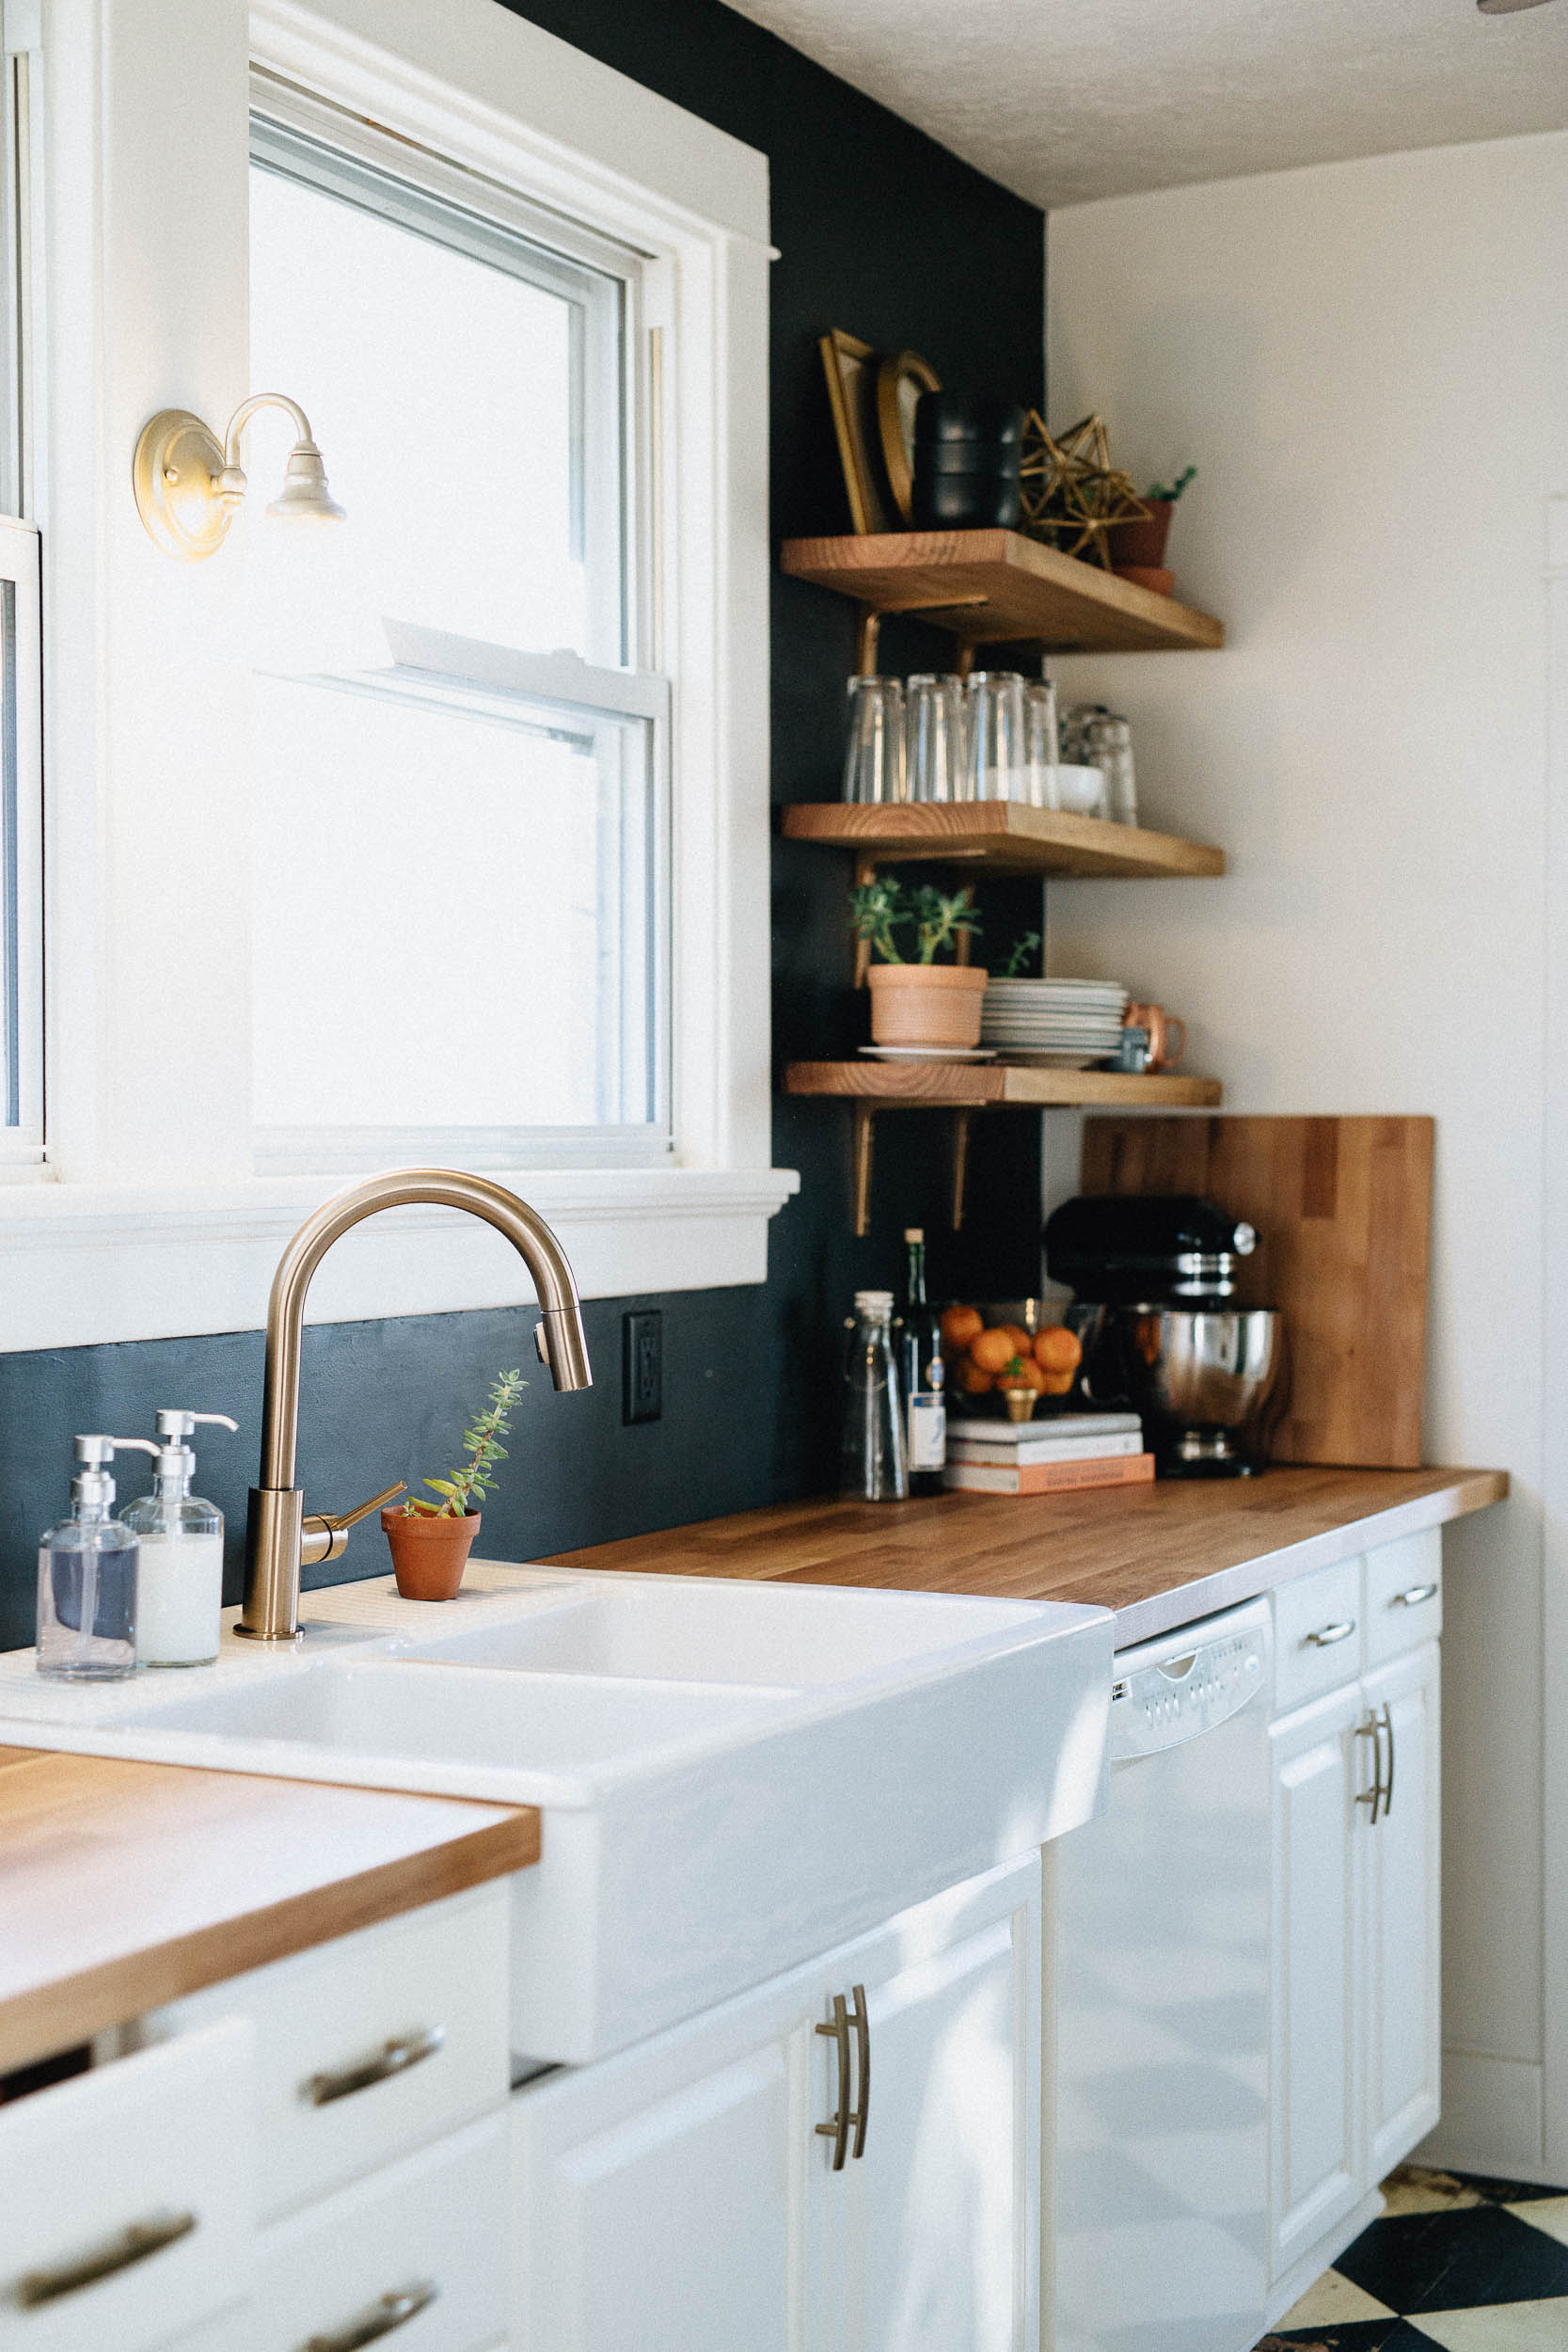 Our DIY Kitchen Remodel  Natural Honest Artistic THE